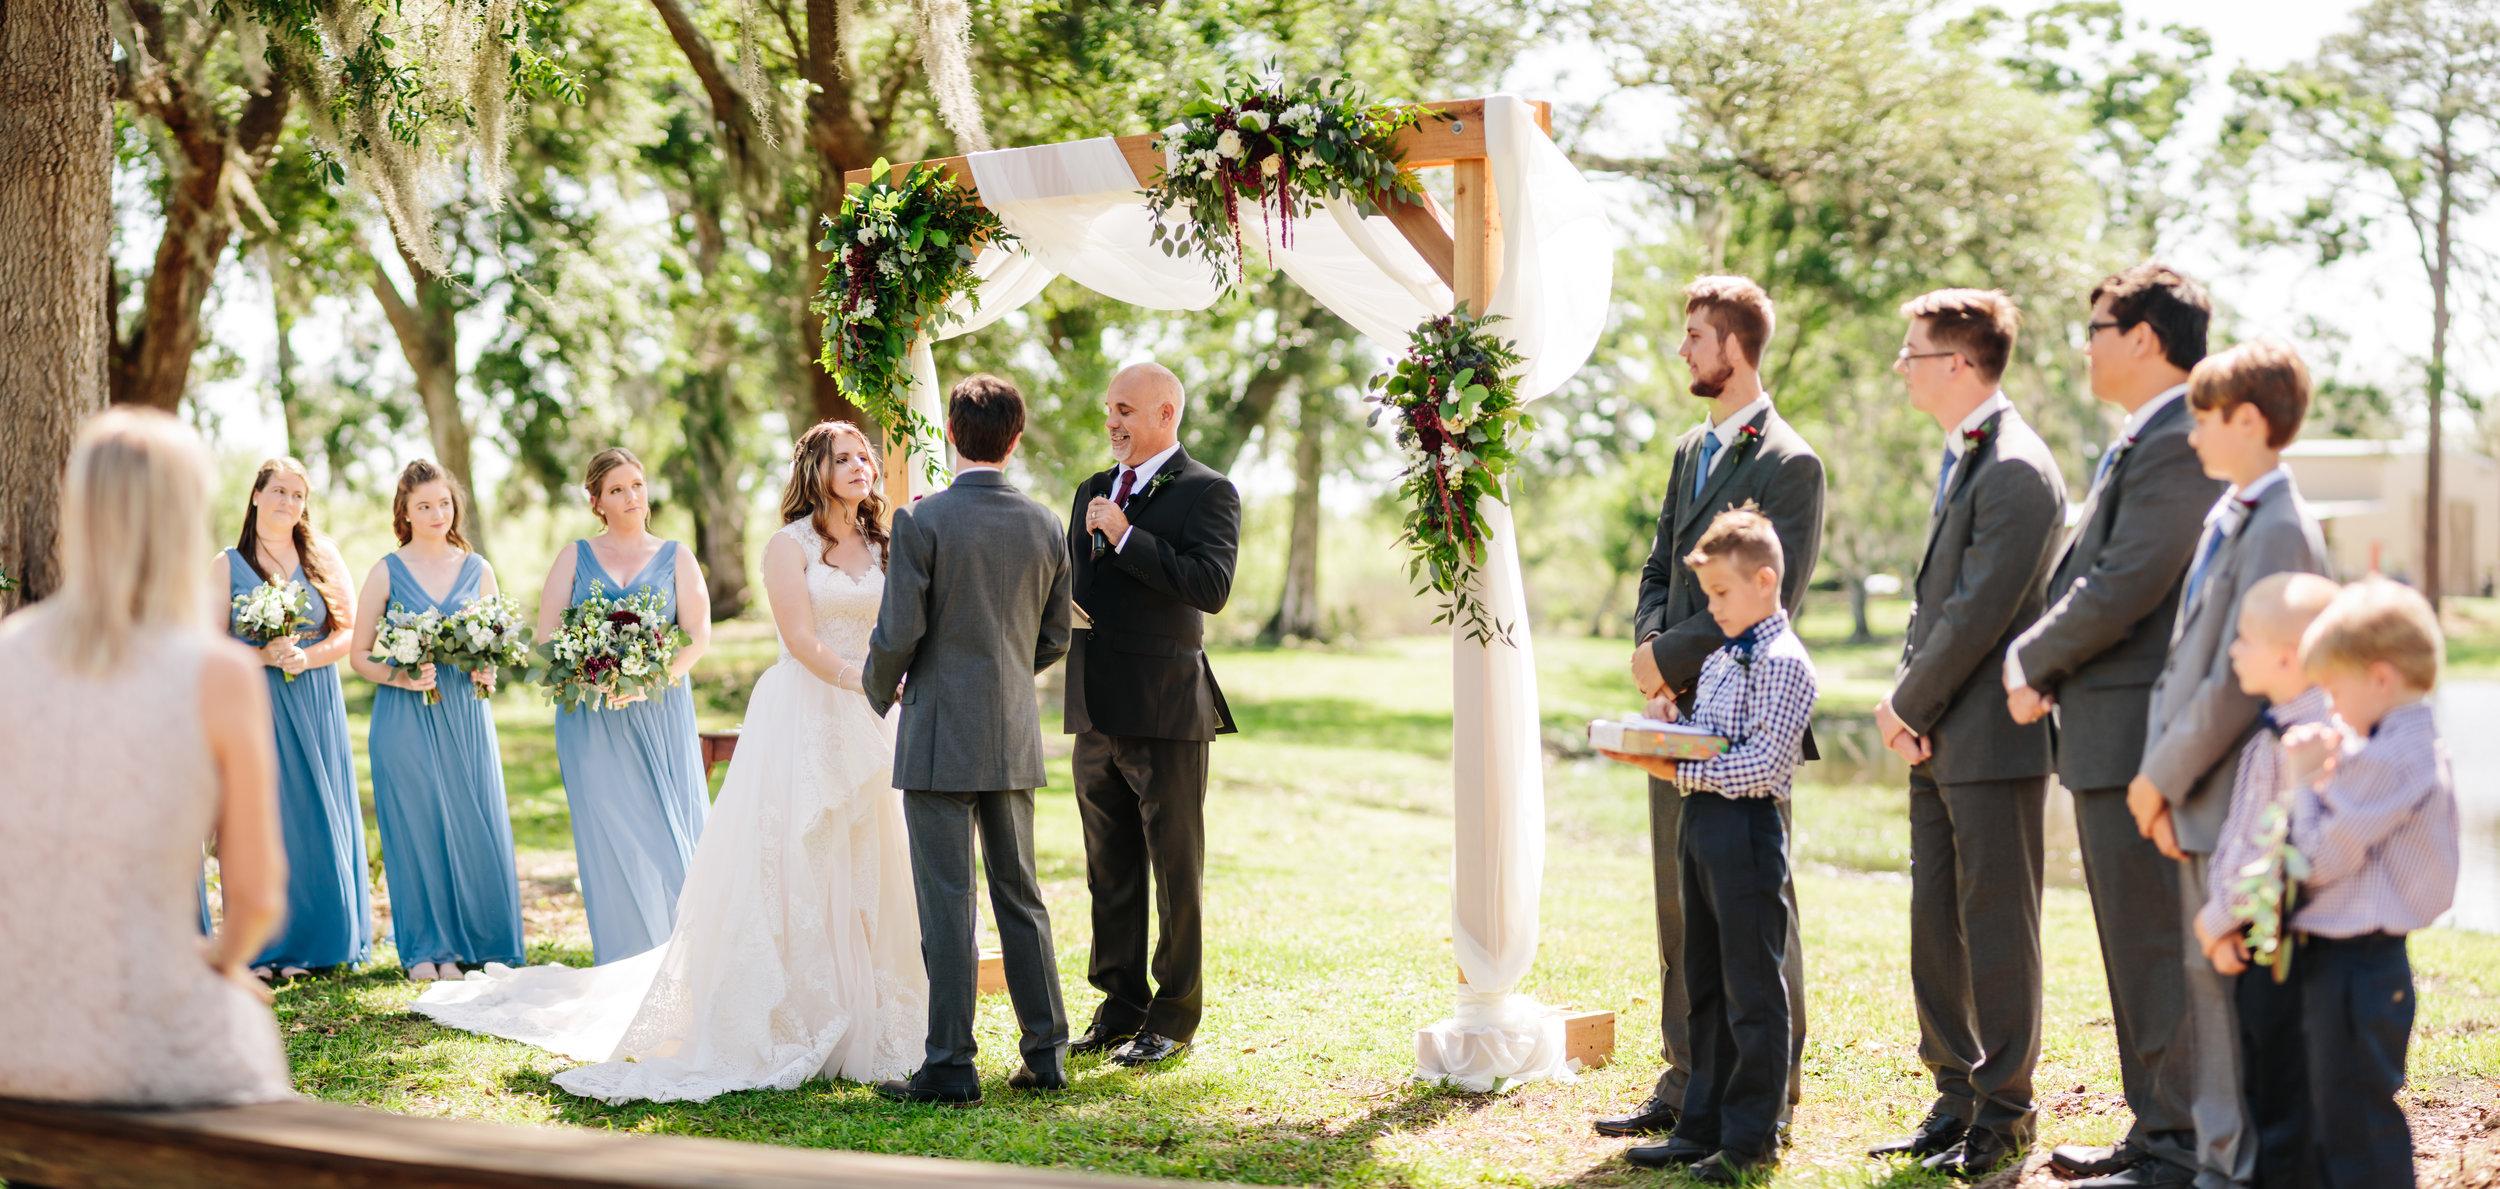 2018.04.14 Zak and Jamisyn Unrue Black Willow Barn Wedding Finals-354.jpg